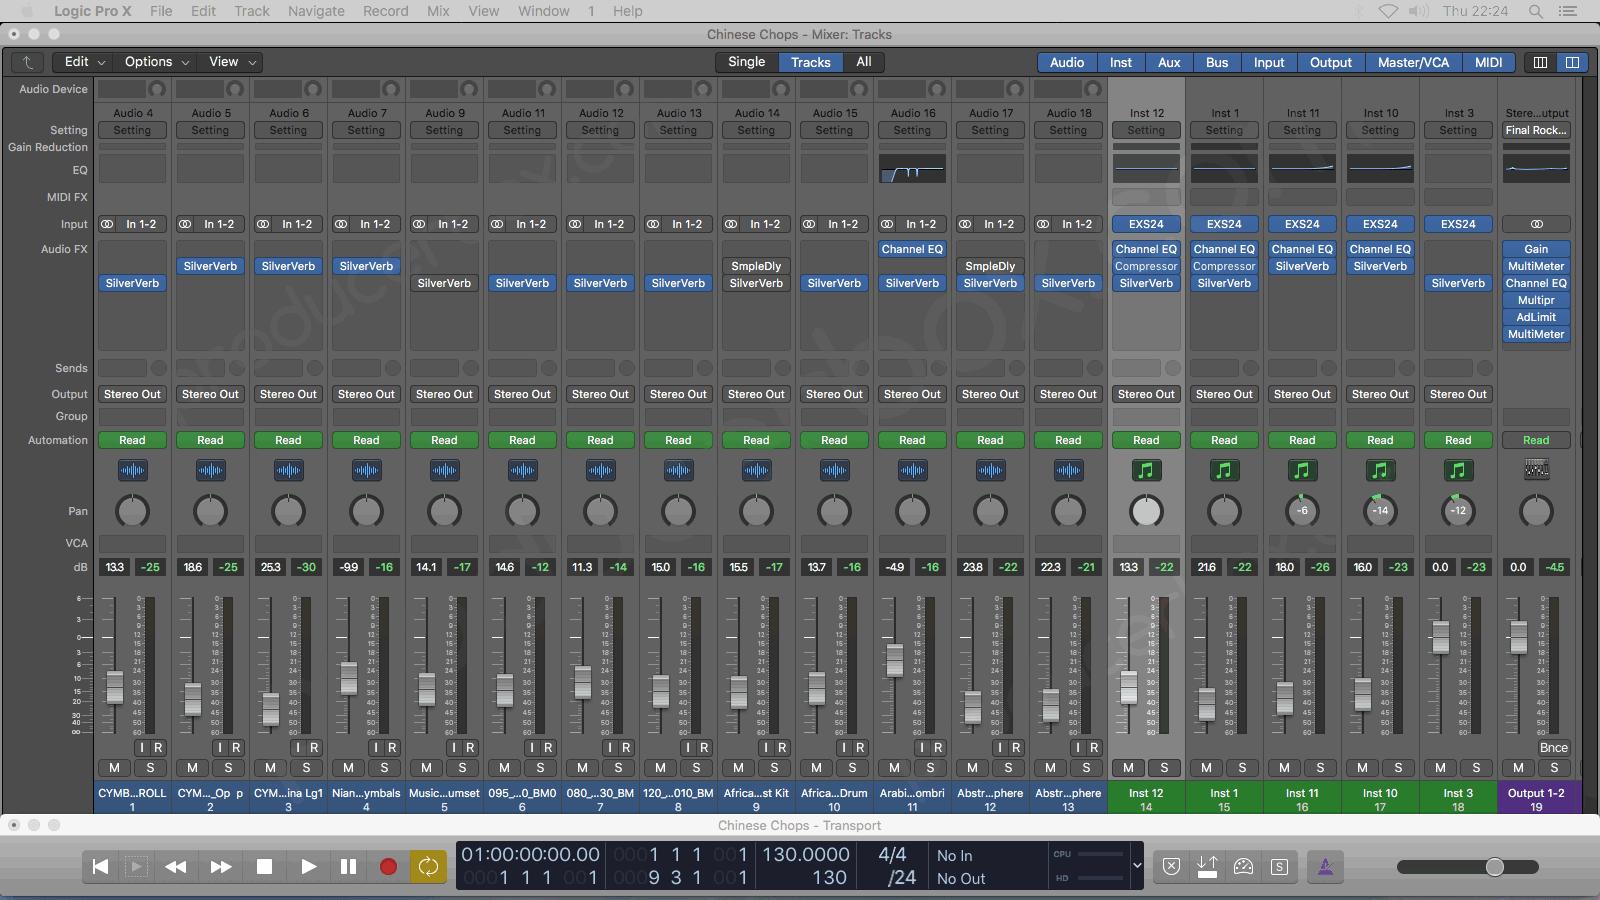 Chinese Chops - Logic Pro X Template (TrackSonix Style)